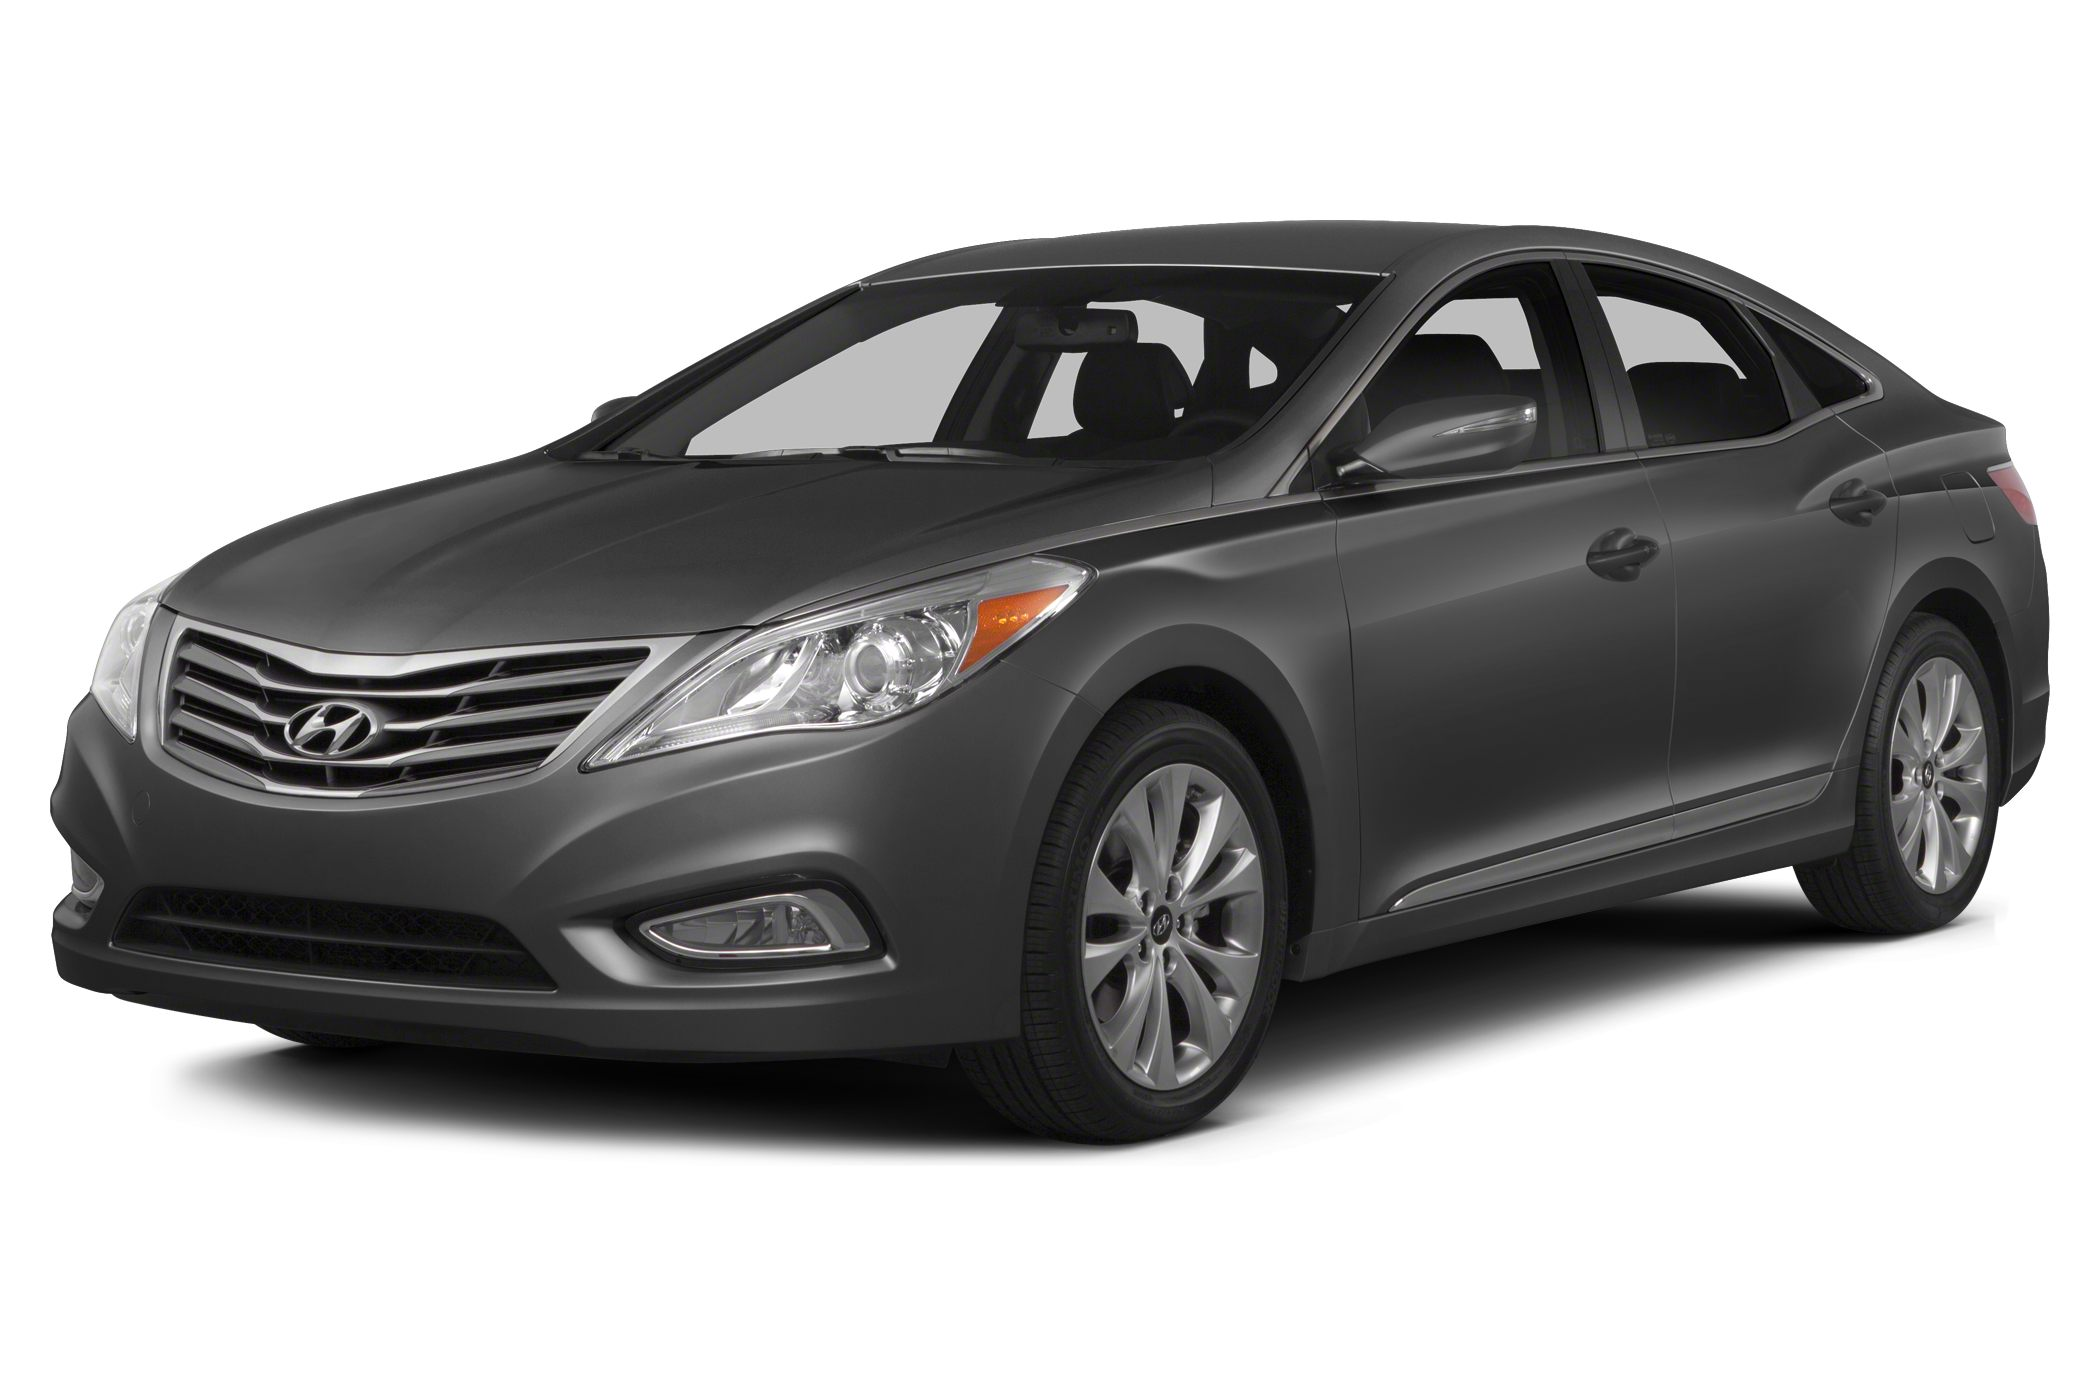 2014 Hyundai Azera Base Sedan for sale in Jasper for $32,175 with 10 miles.